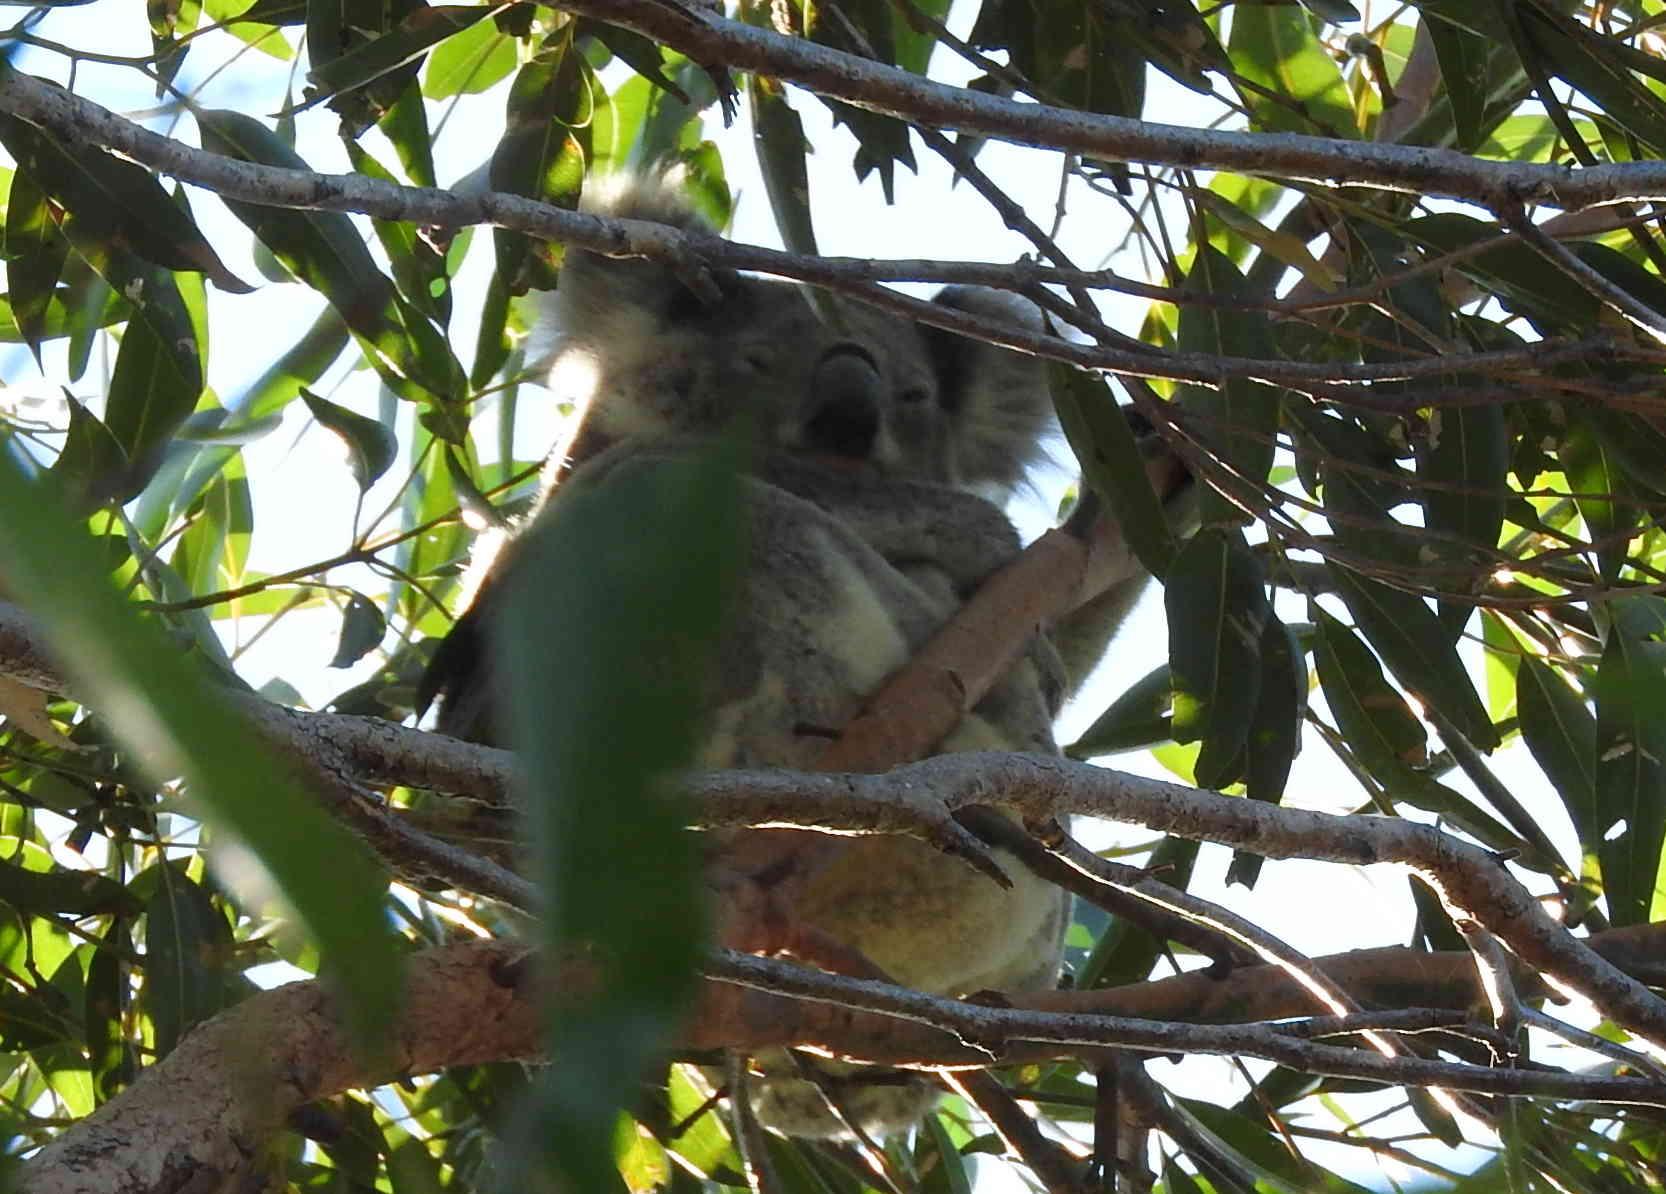 Koala is camera shy